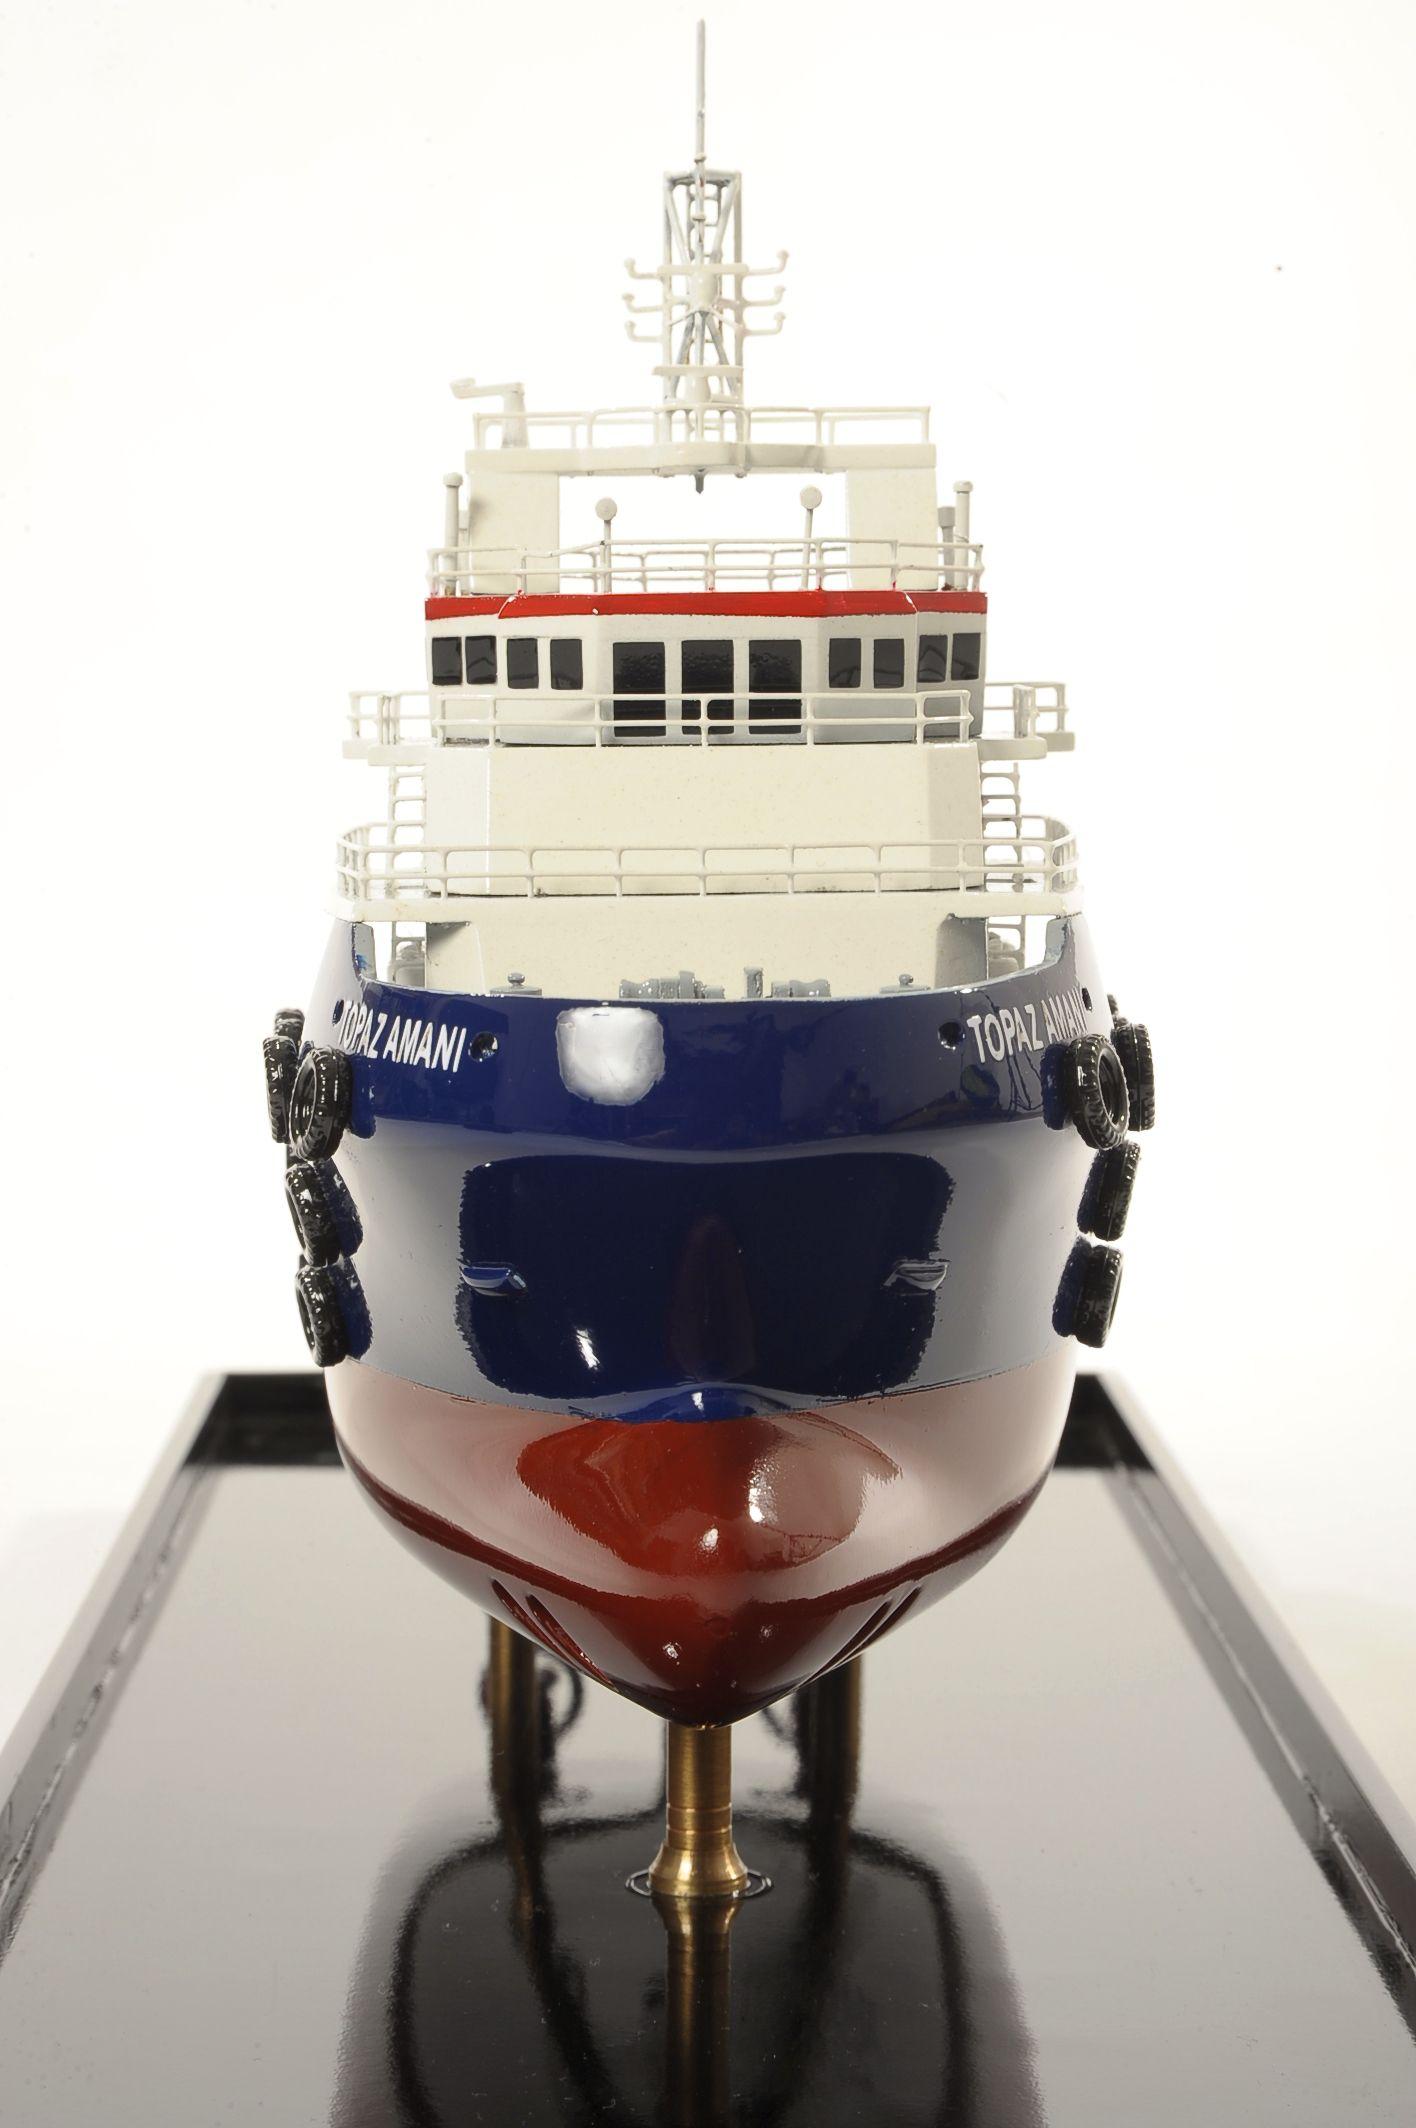 1515-8929-Topaz-Marine-Supply-Vessel-Model-ship